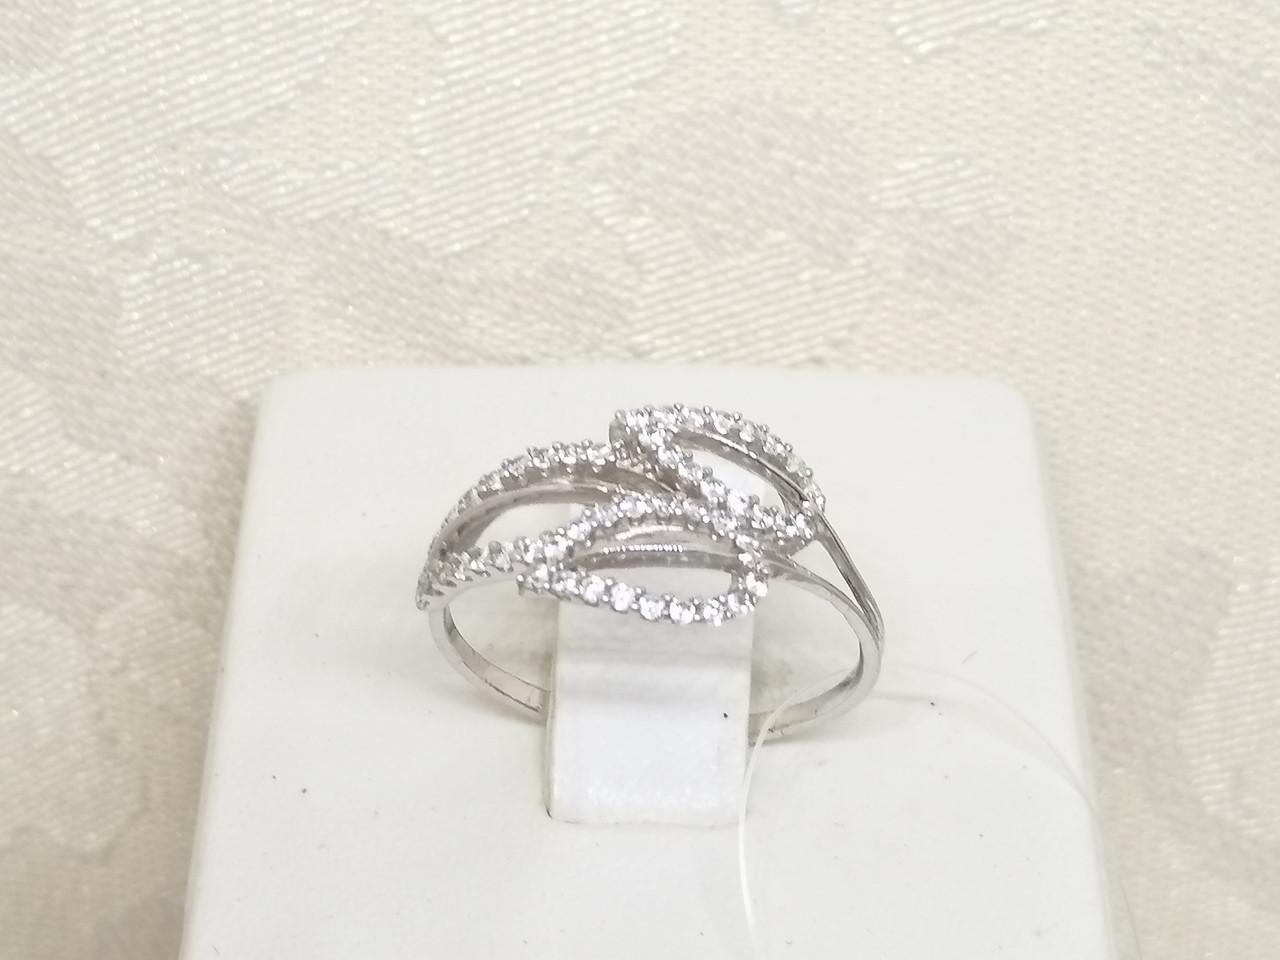 Серебряное кольцо с фианитами. Артикул 901-00414 16,5